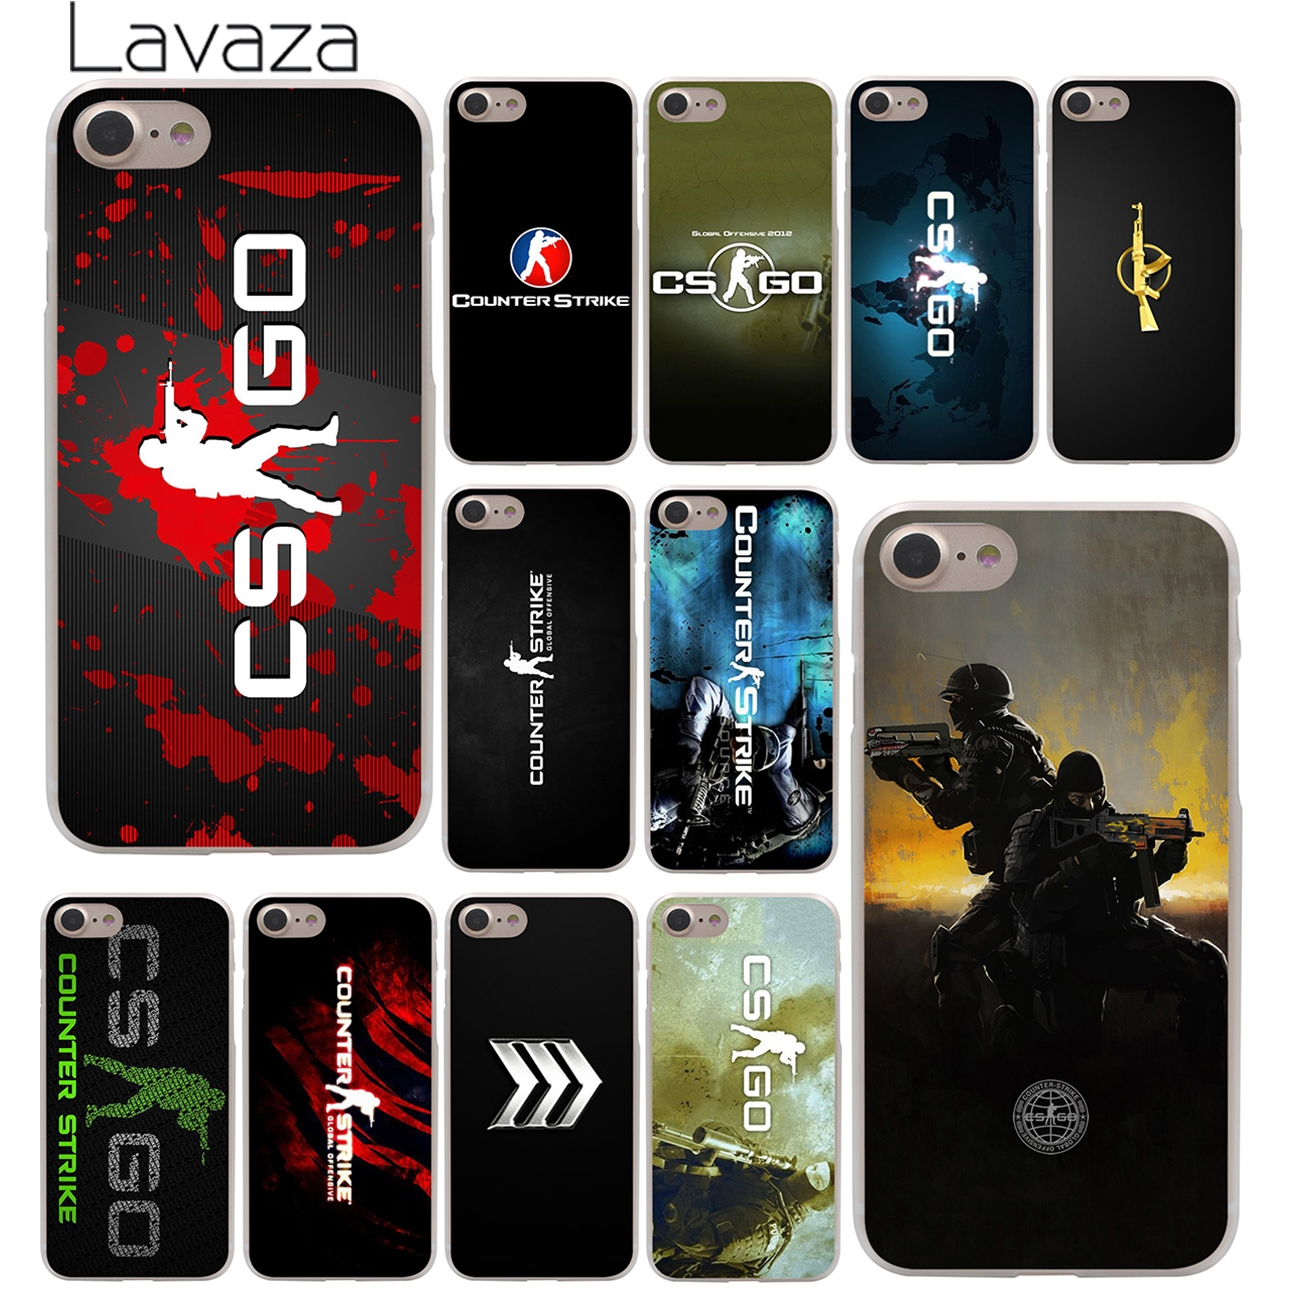 Counter Strike cs go Hard Case Transparent for iPhone 7 7 Plus 6 6s Plus 5 5S SE 5C 4 4S